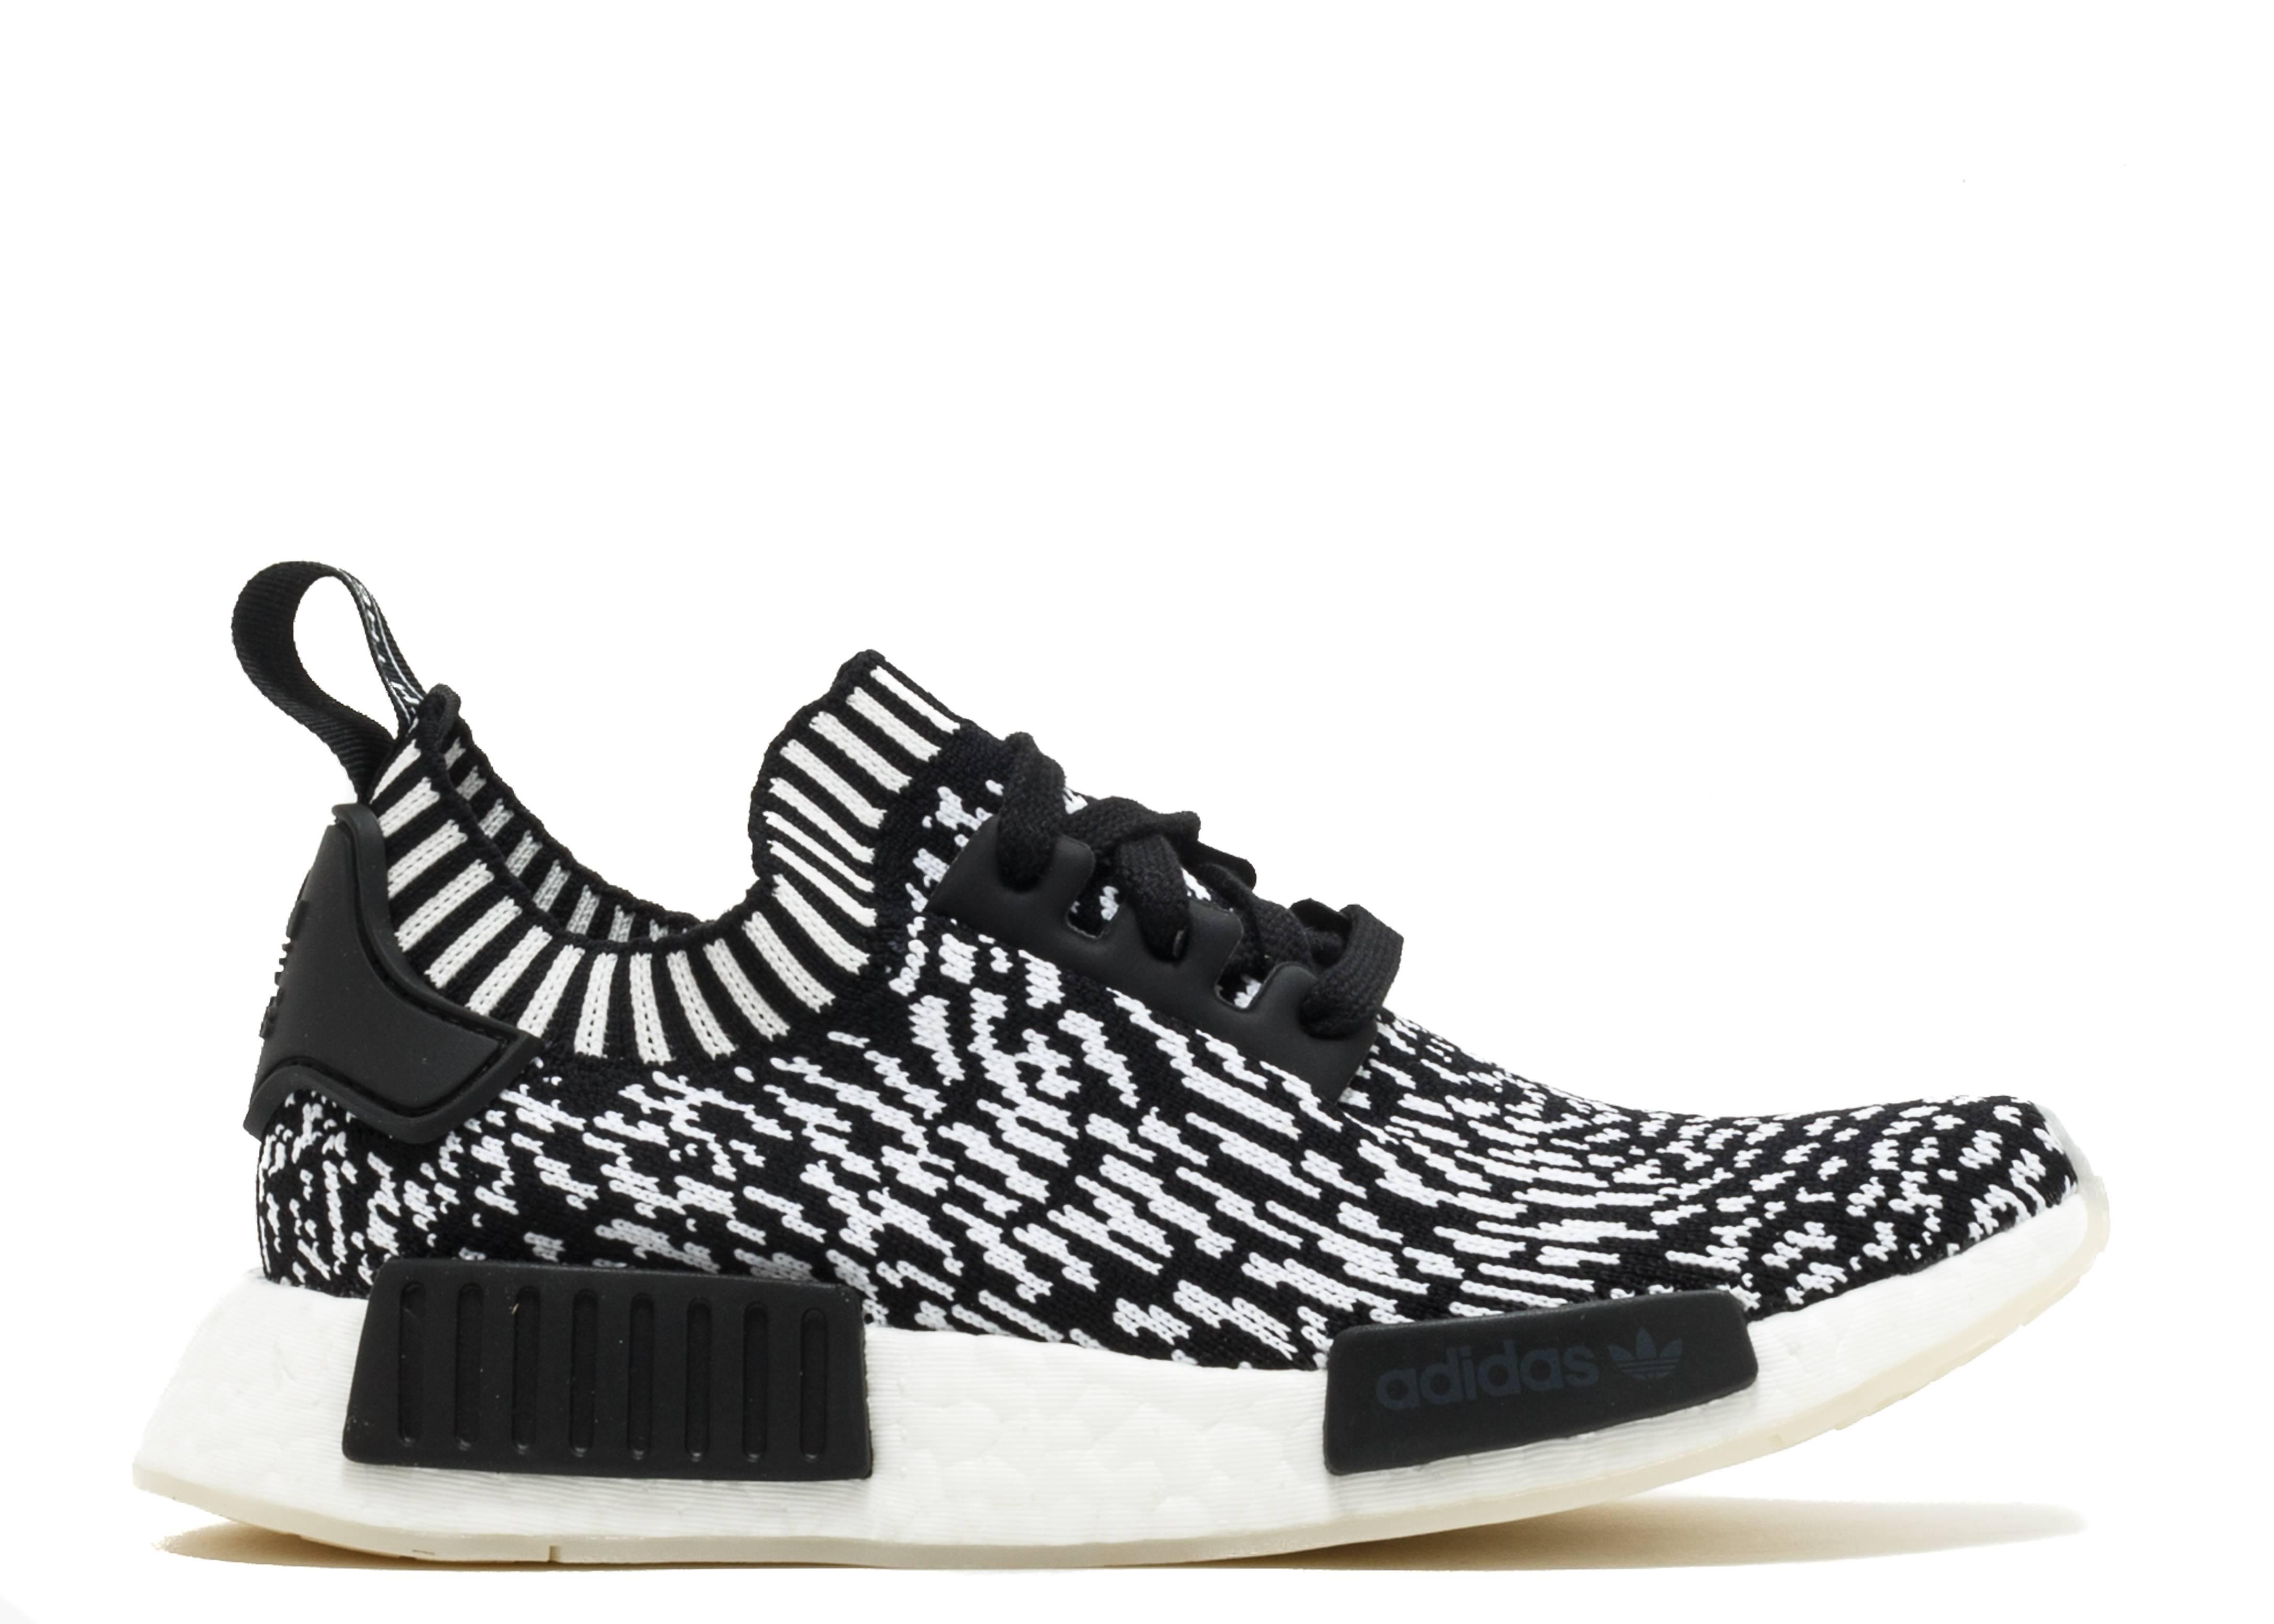 Nmd R1 Primeknit Zebra Adidas By3013 Core Black White